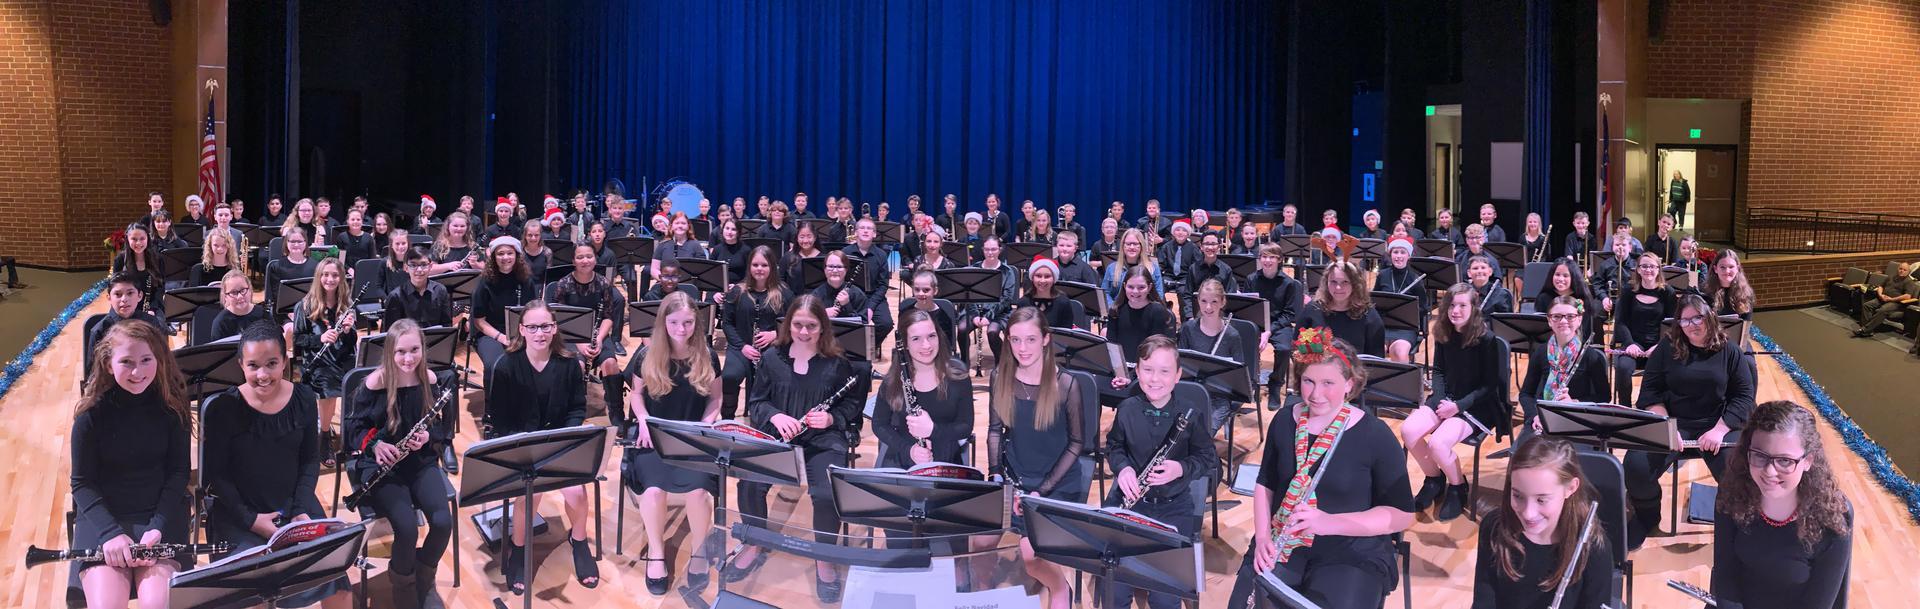 6th Grade Band Winter Concert 2019